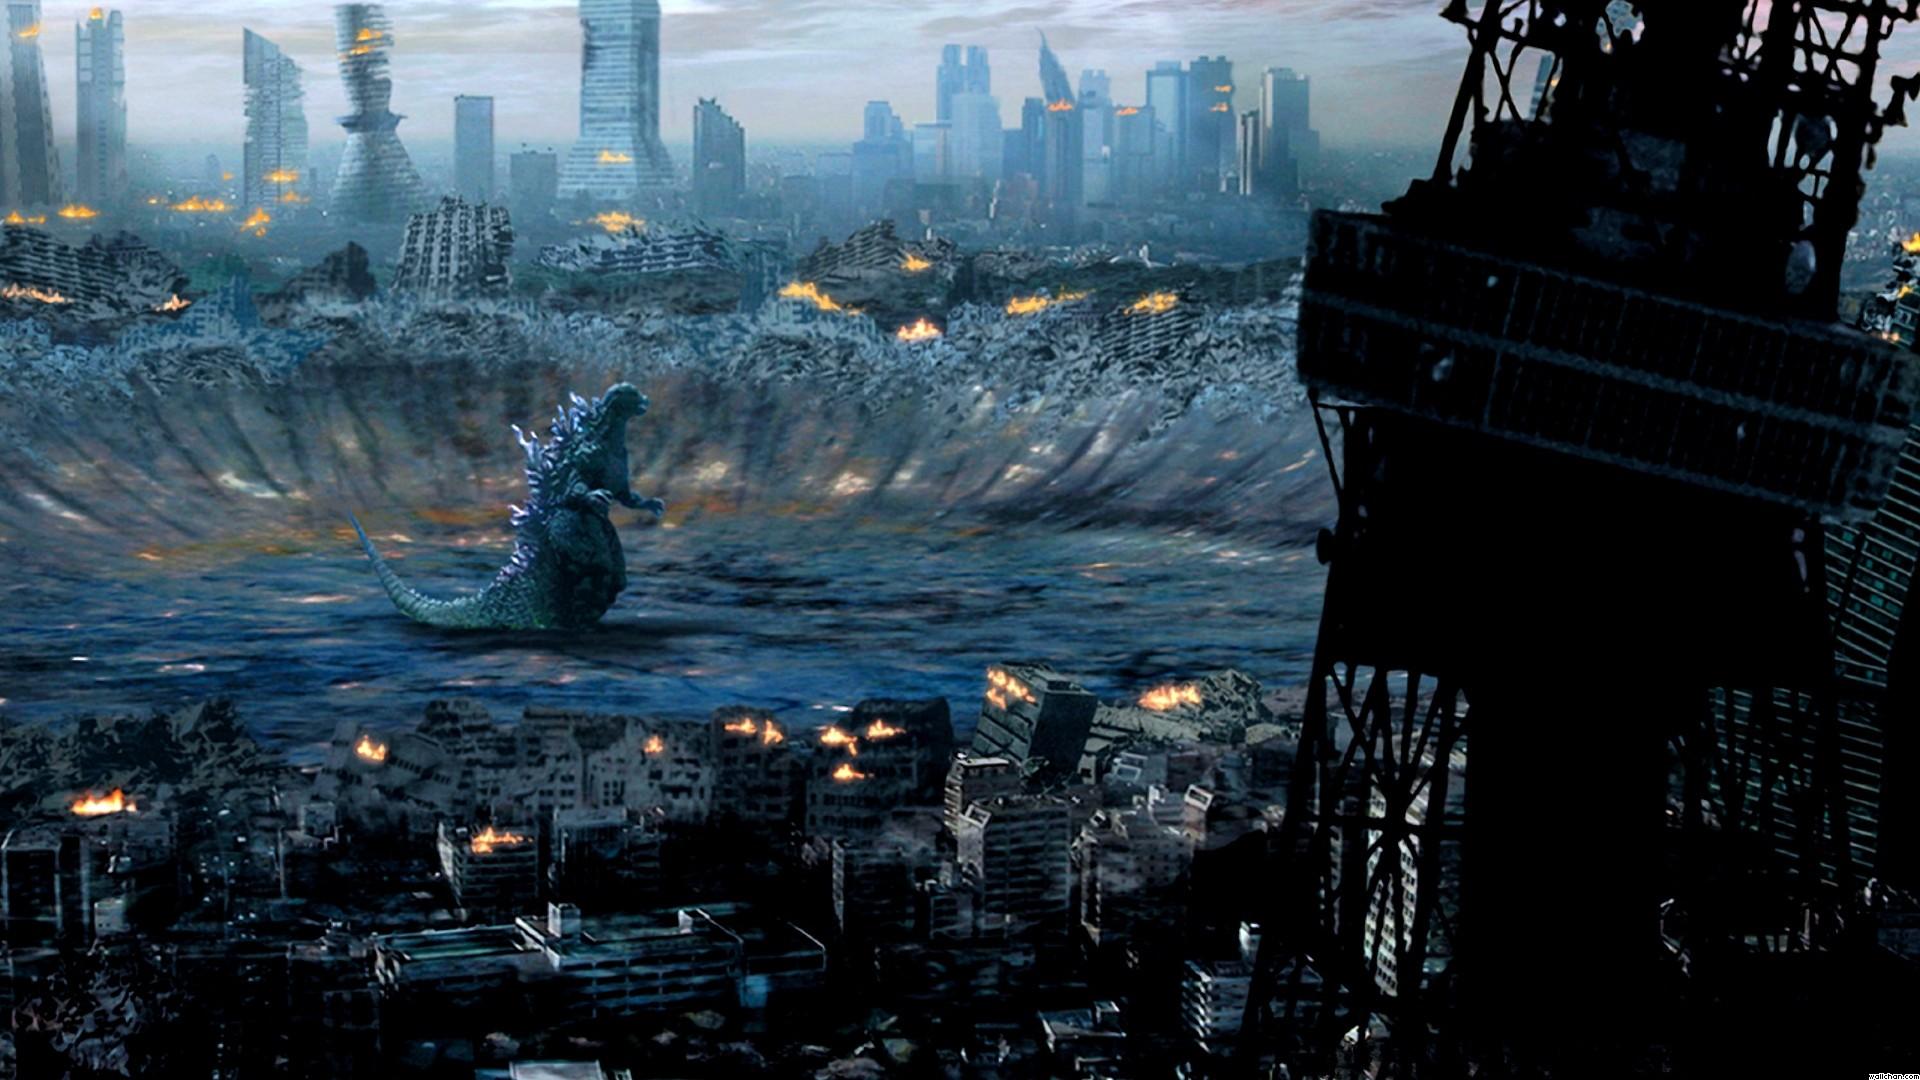 Godzilla Wallpaper Images | HD Wallpapers | Pinterest | Godzilla, Wallpaper  and Hd wallpaper